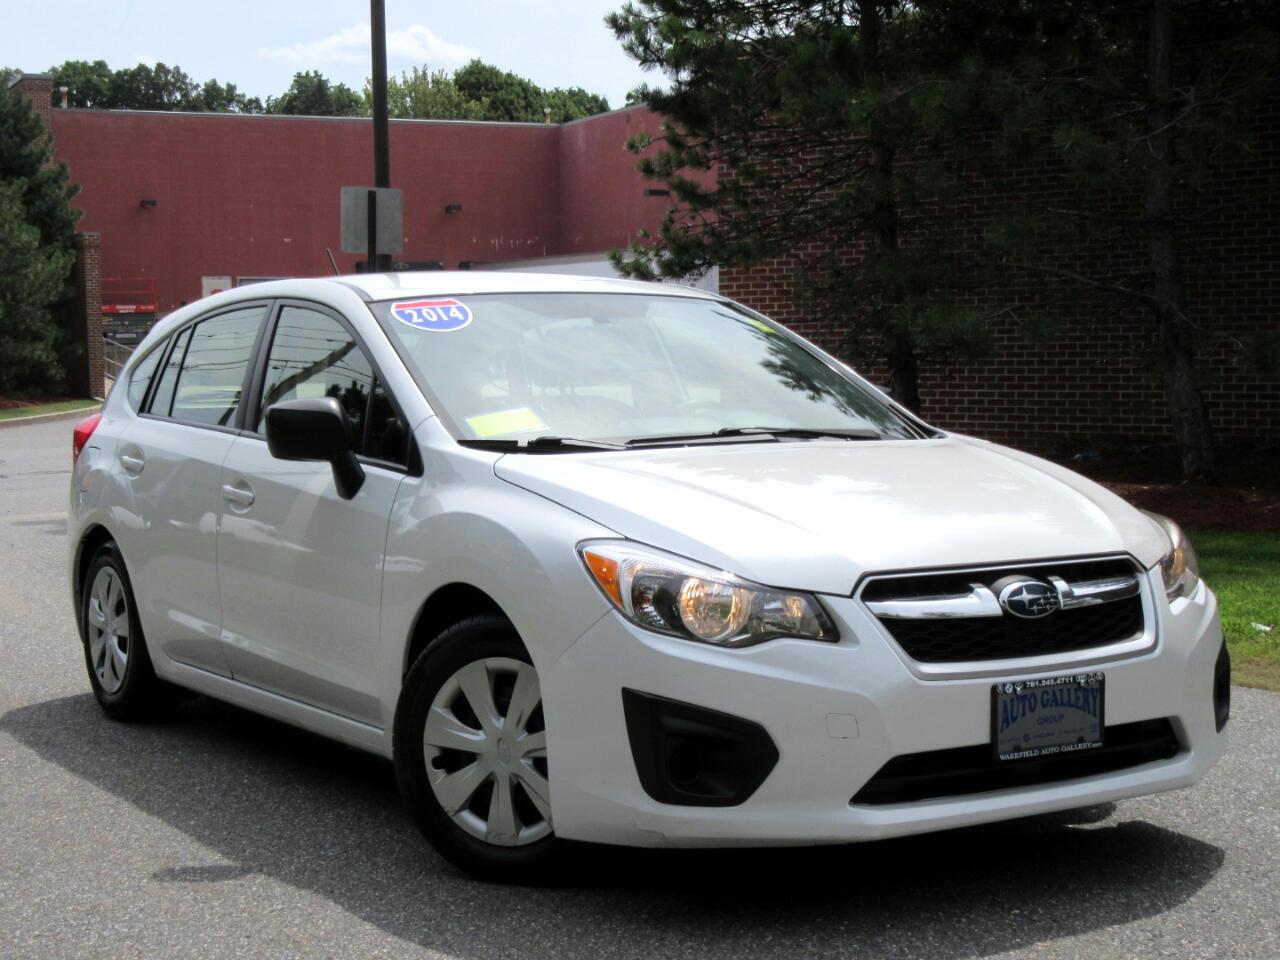 2014 Subaru Impreza Wagon 5dr Auto 2.0i